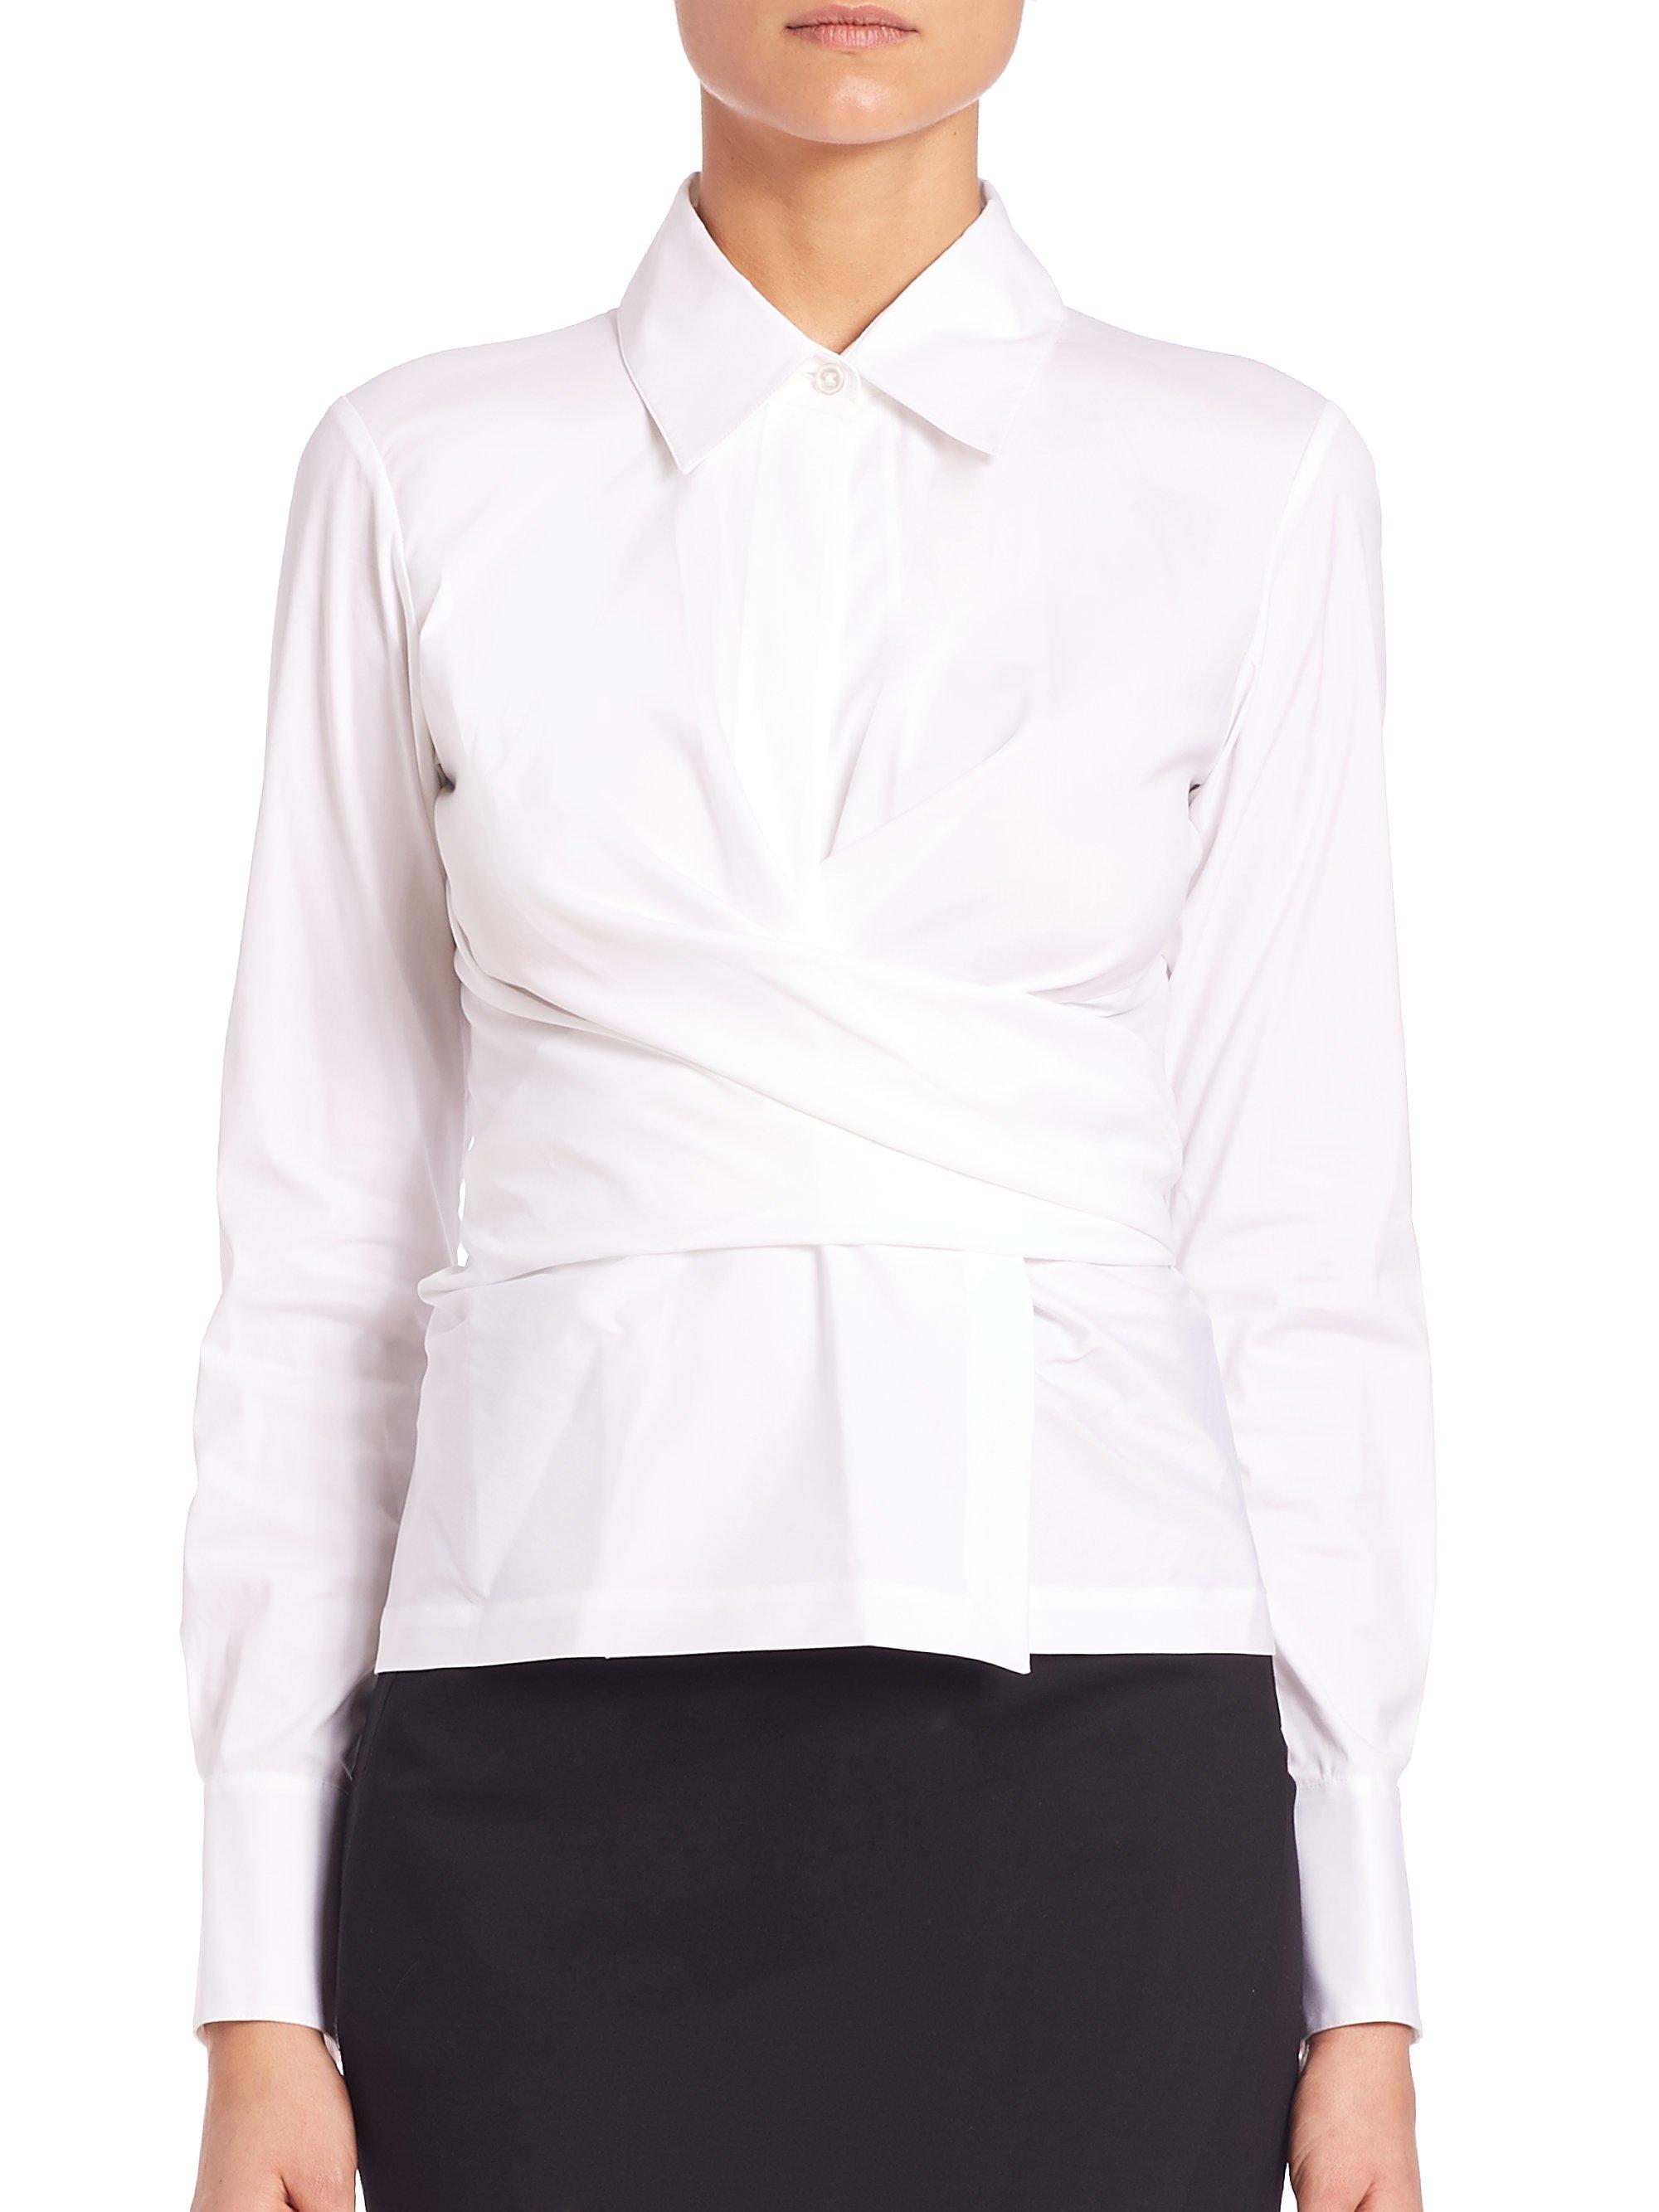 961981d843c37 Lyst - Donna Karan Stretch-cotton Wrap Shirt in White